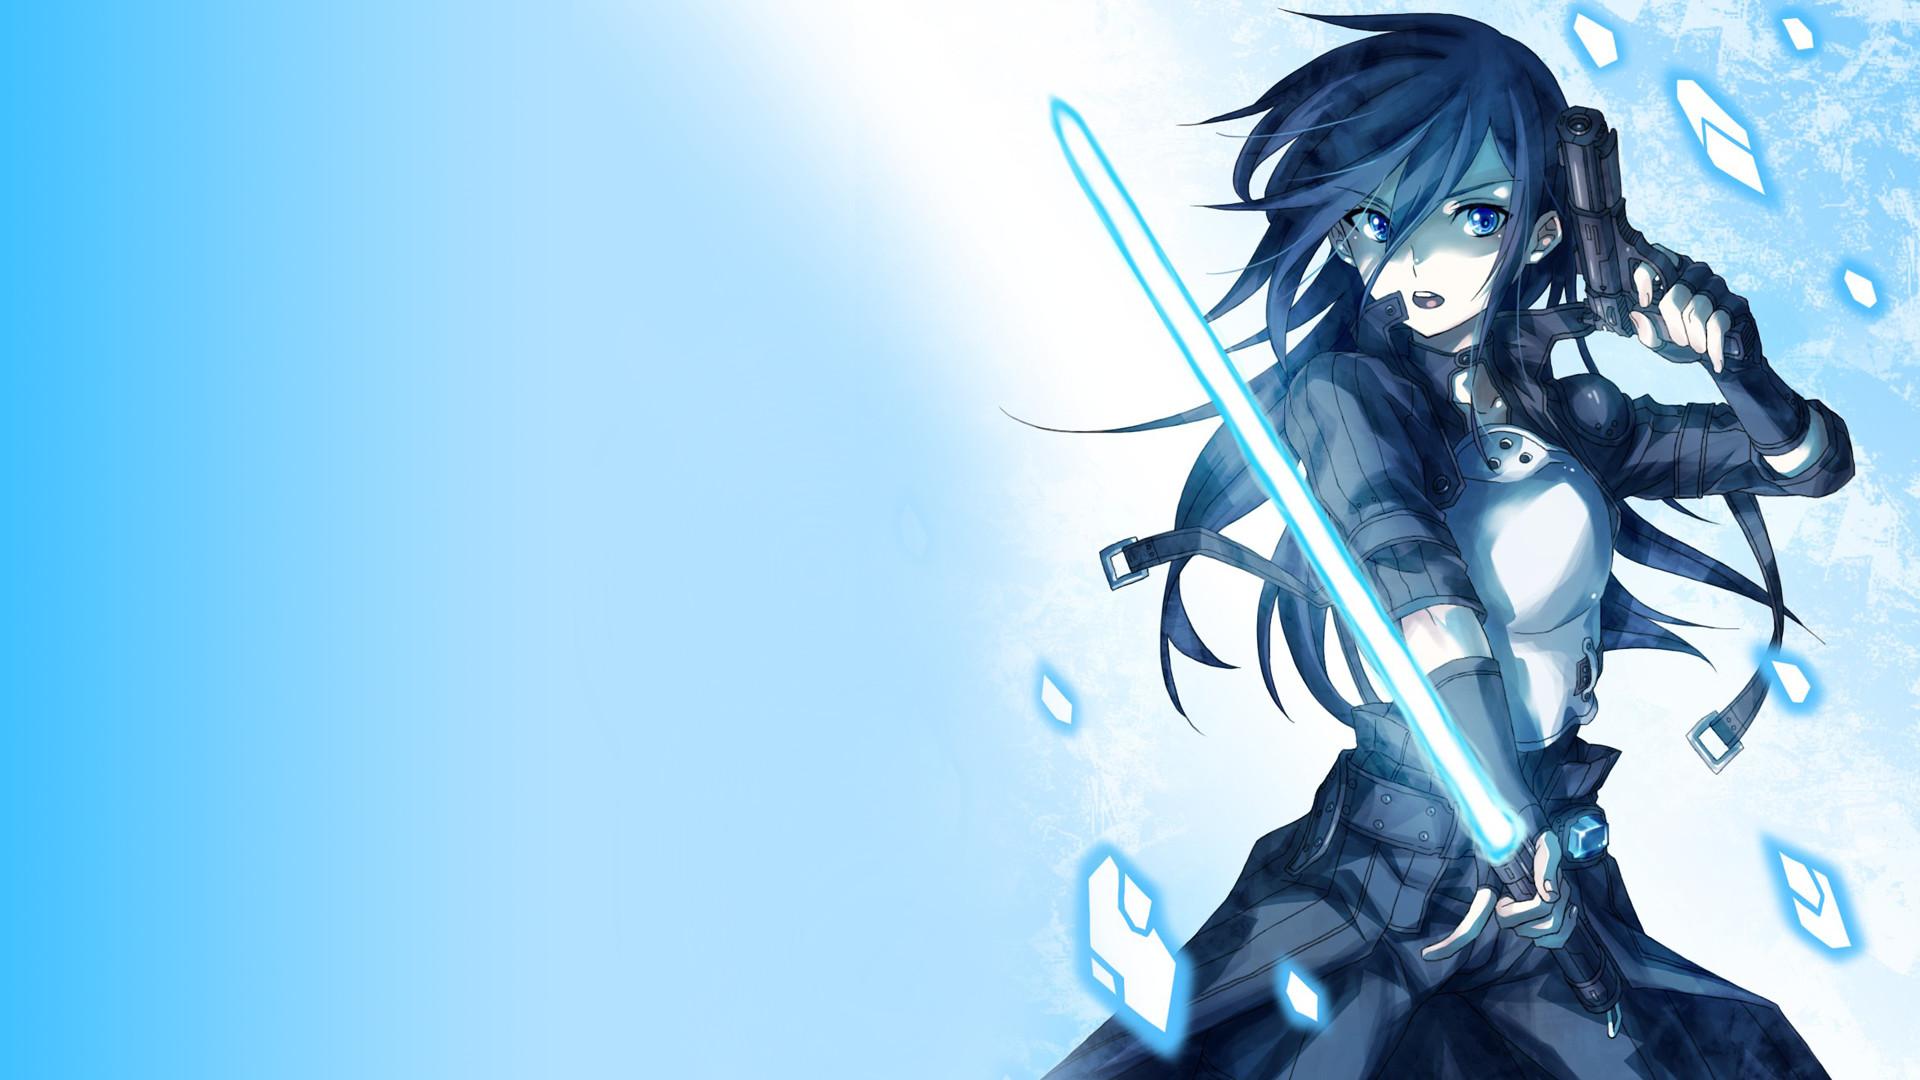 Anime Girl With Gun And Sword Wallpaper